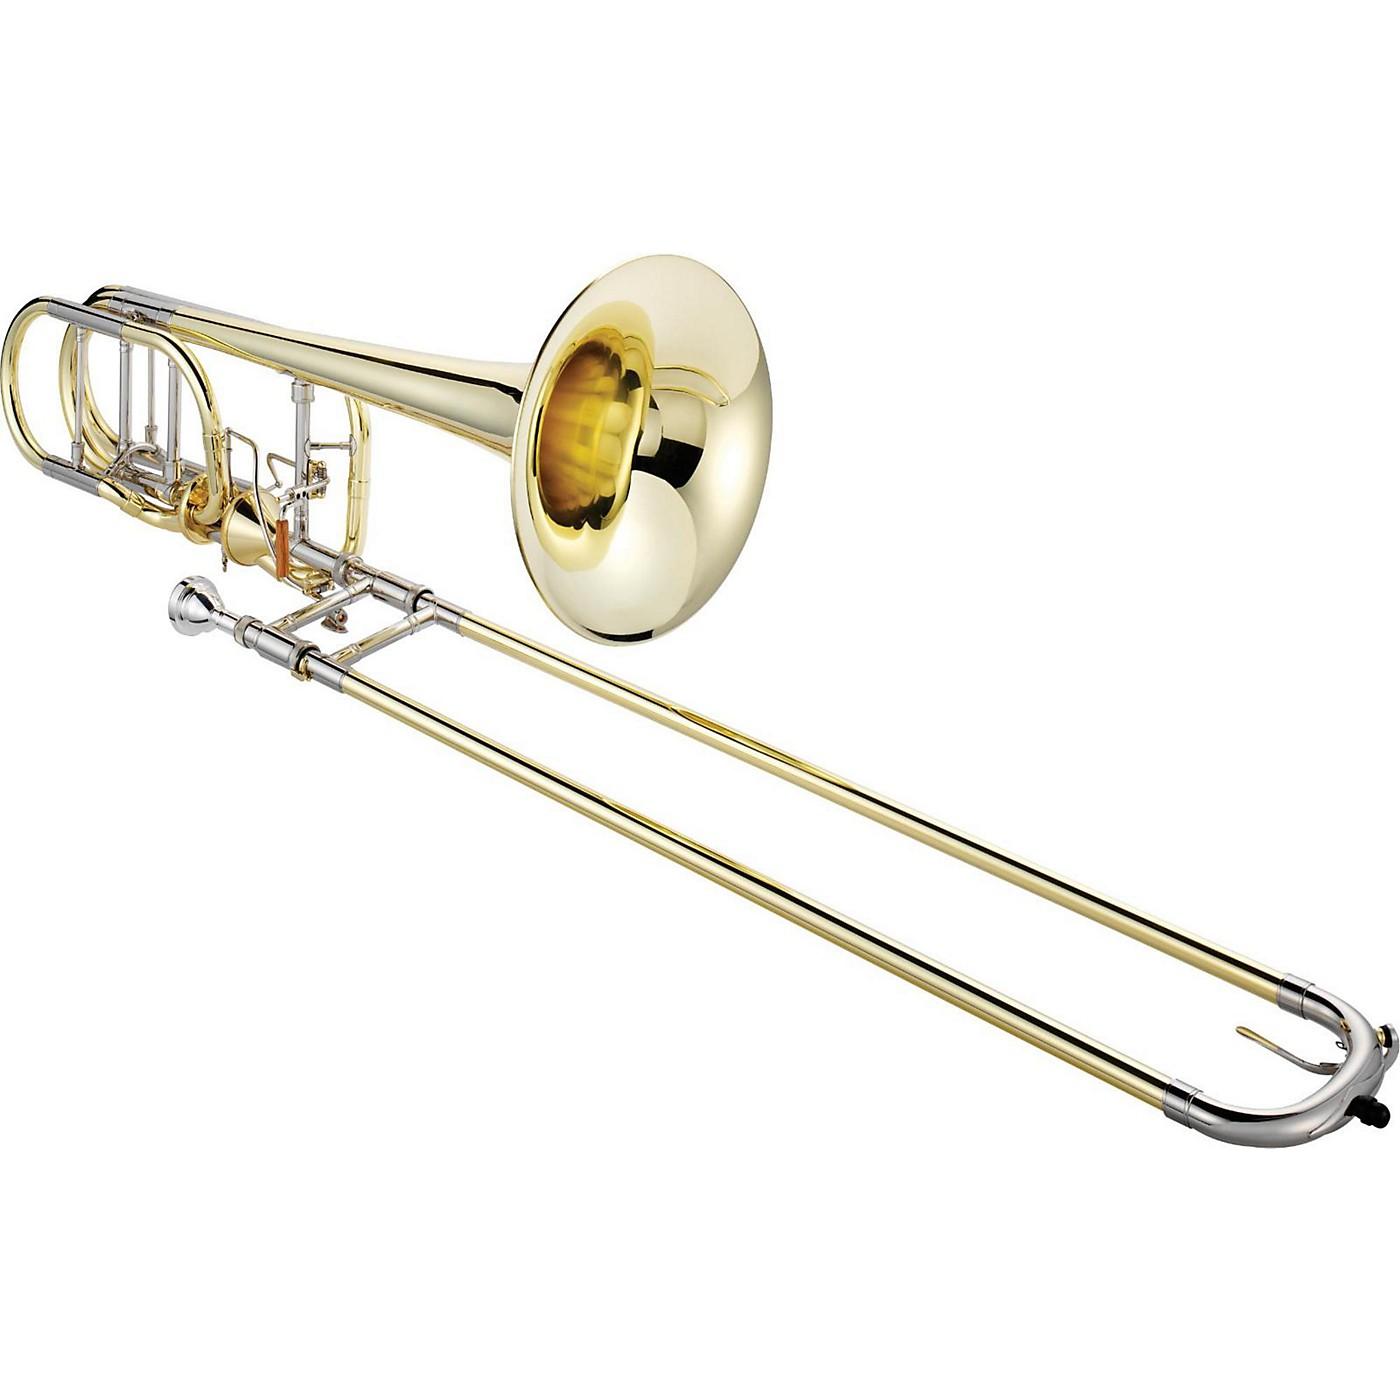 XO 1240 Professional Series Bass Trombone with Thru-Flo Valve thumbnail